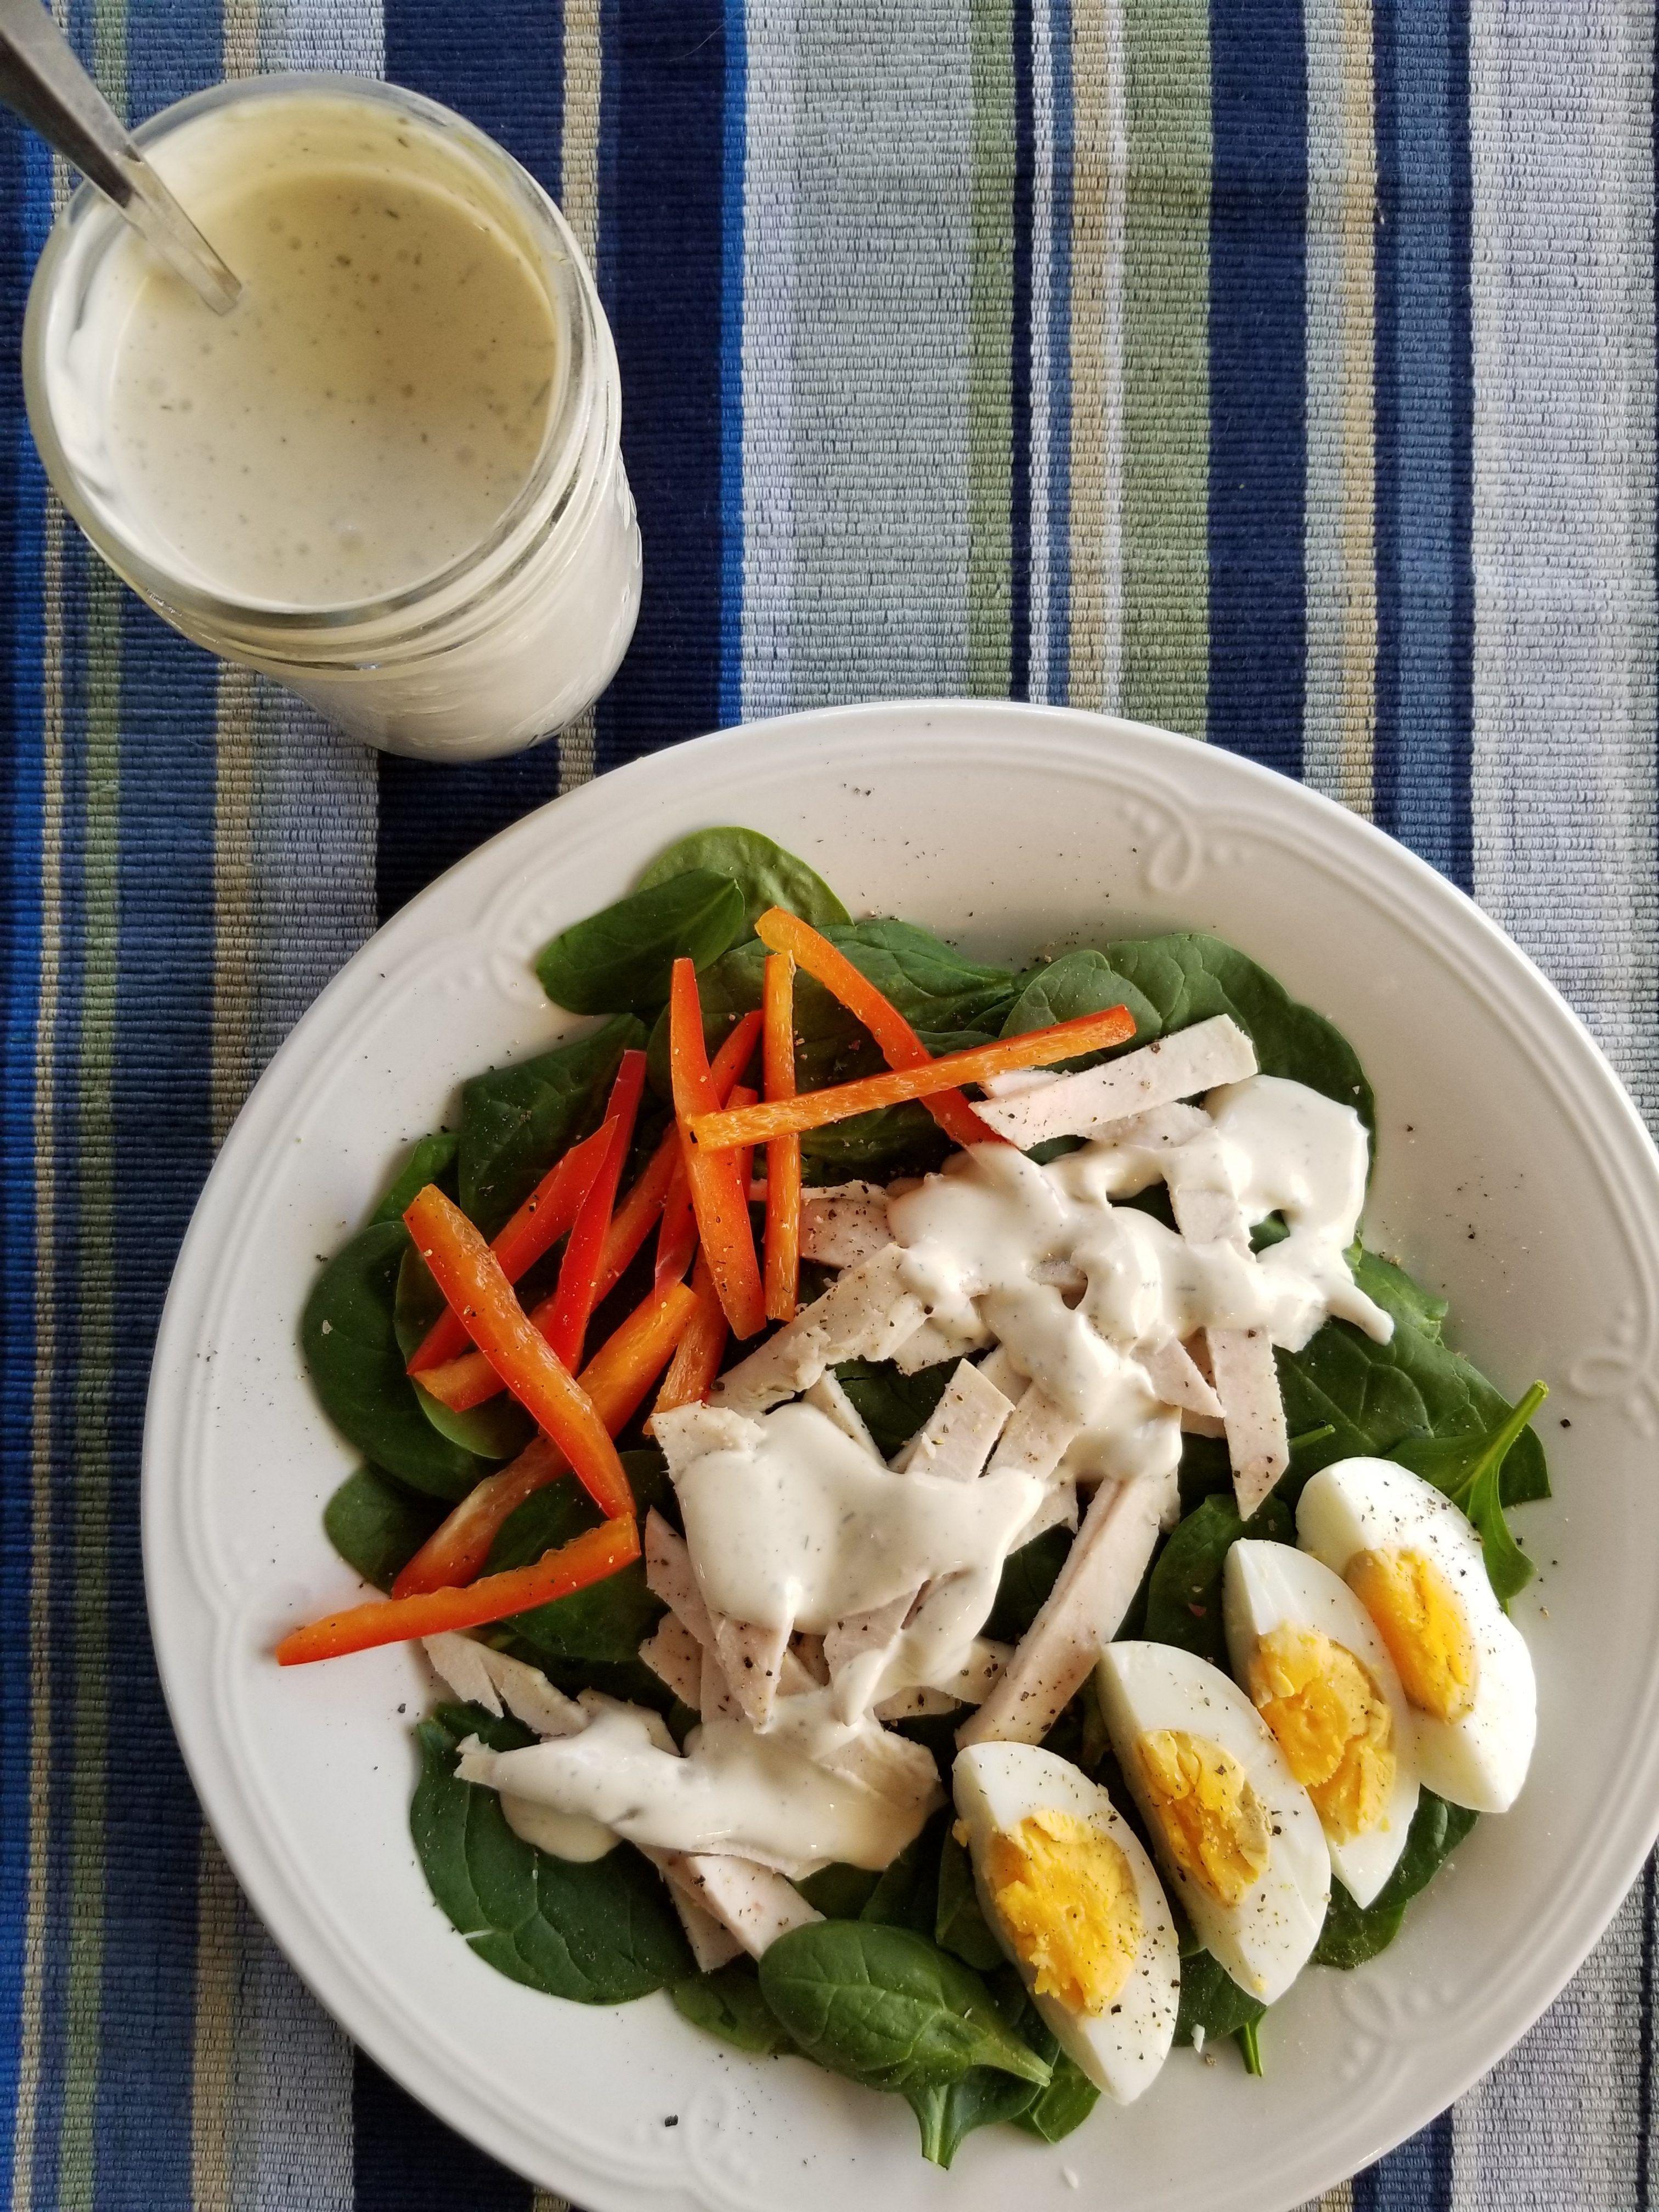 Boursin ranch salad dressing recipe salad dressing